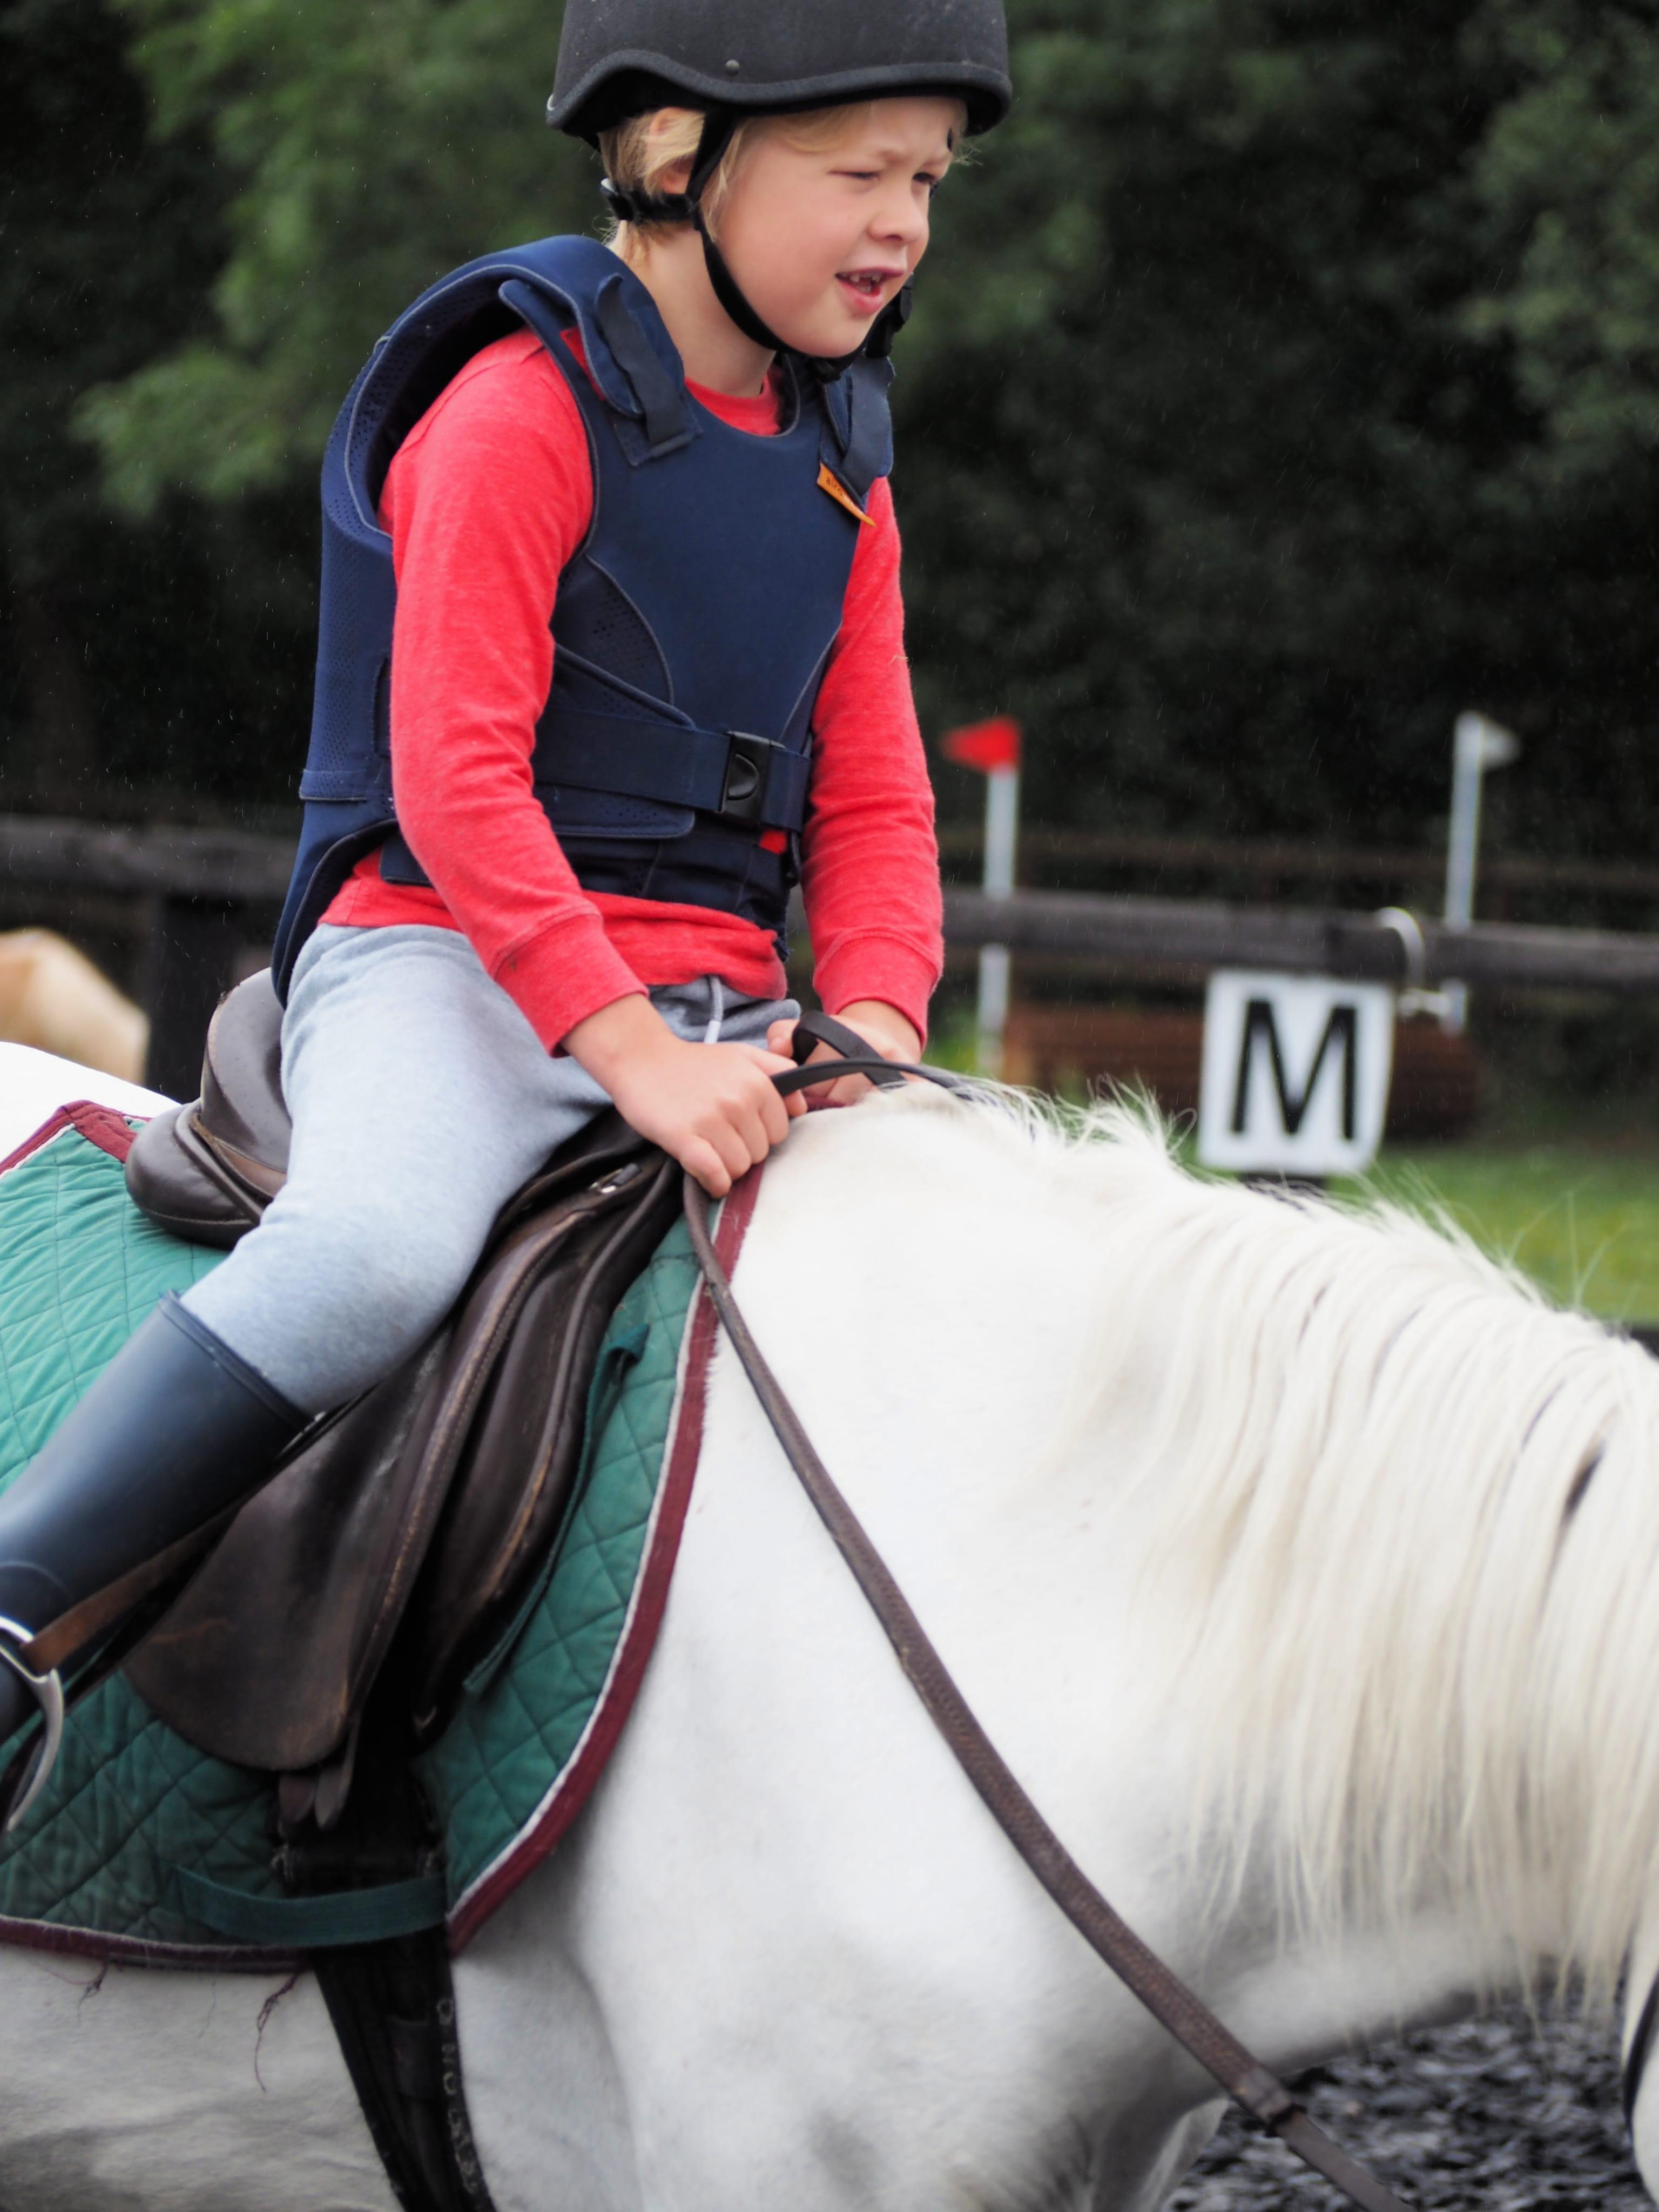 Logan riding